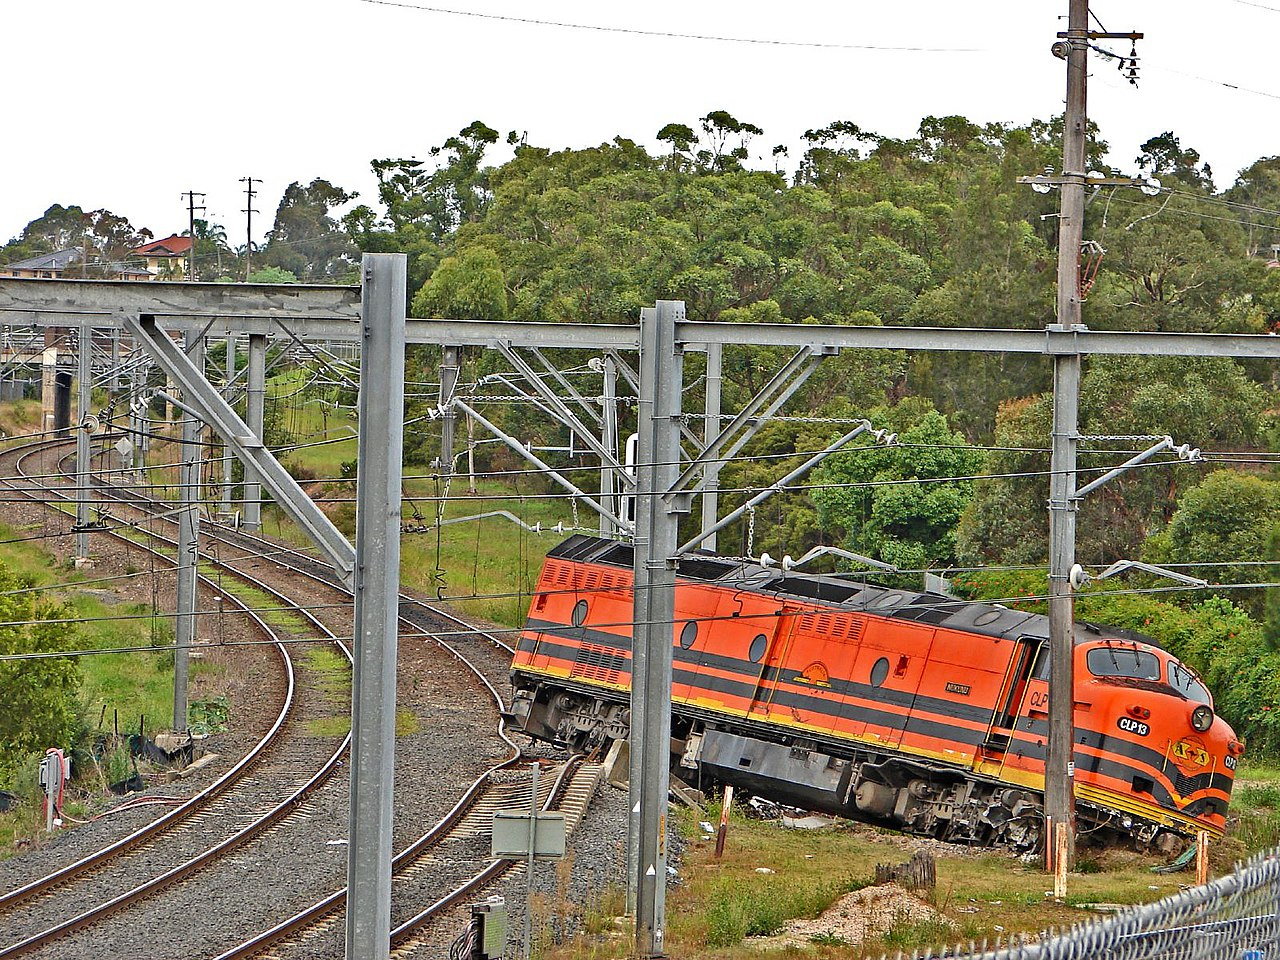 off the rails - photo #34